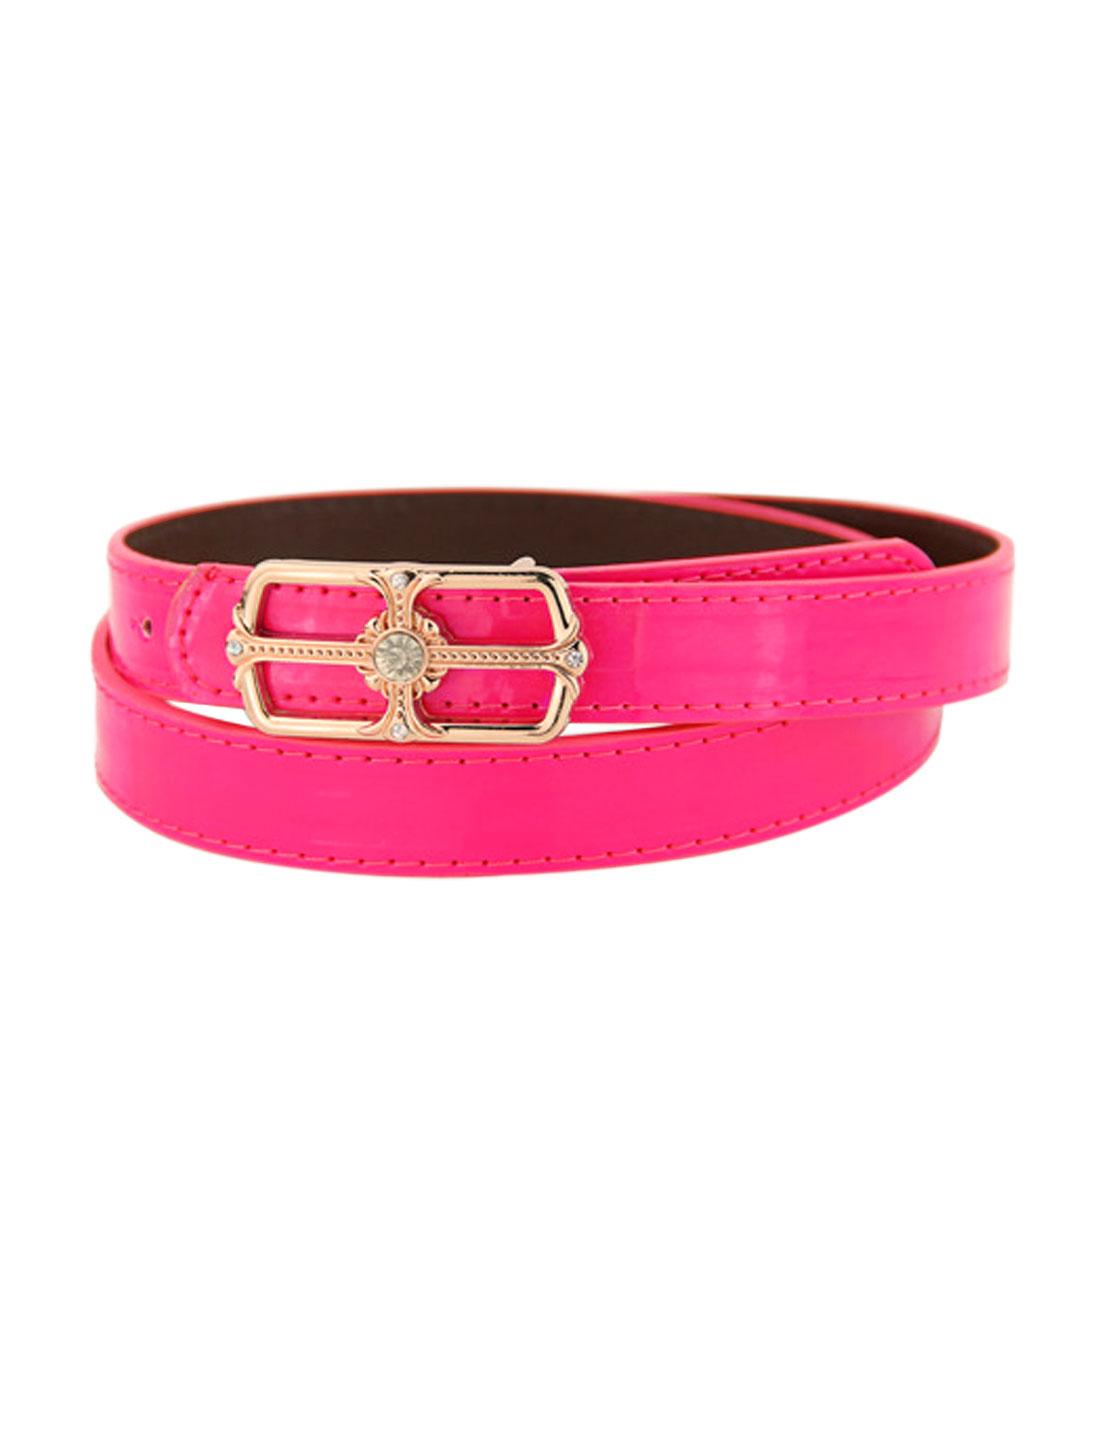 Women Rhinestone Decor Square Press Buckle PU Skinny Belt Pink